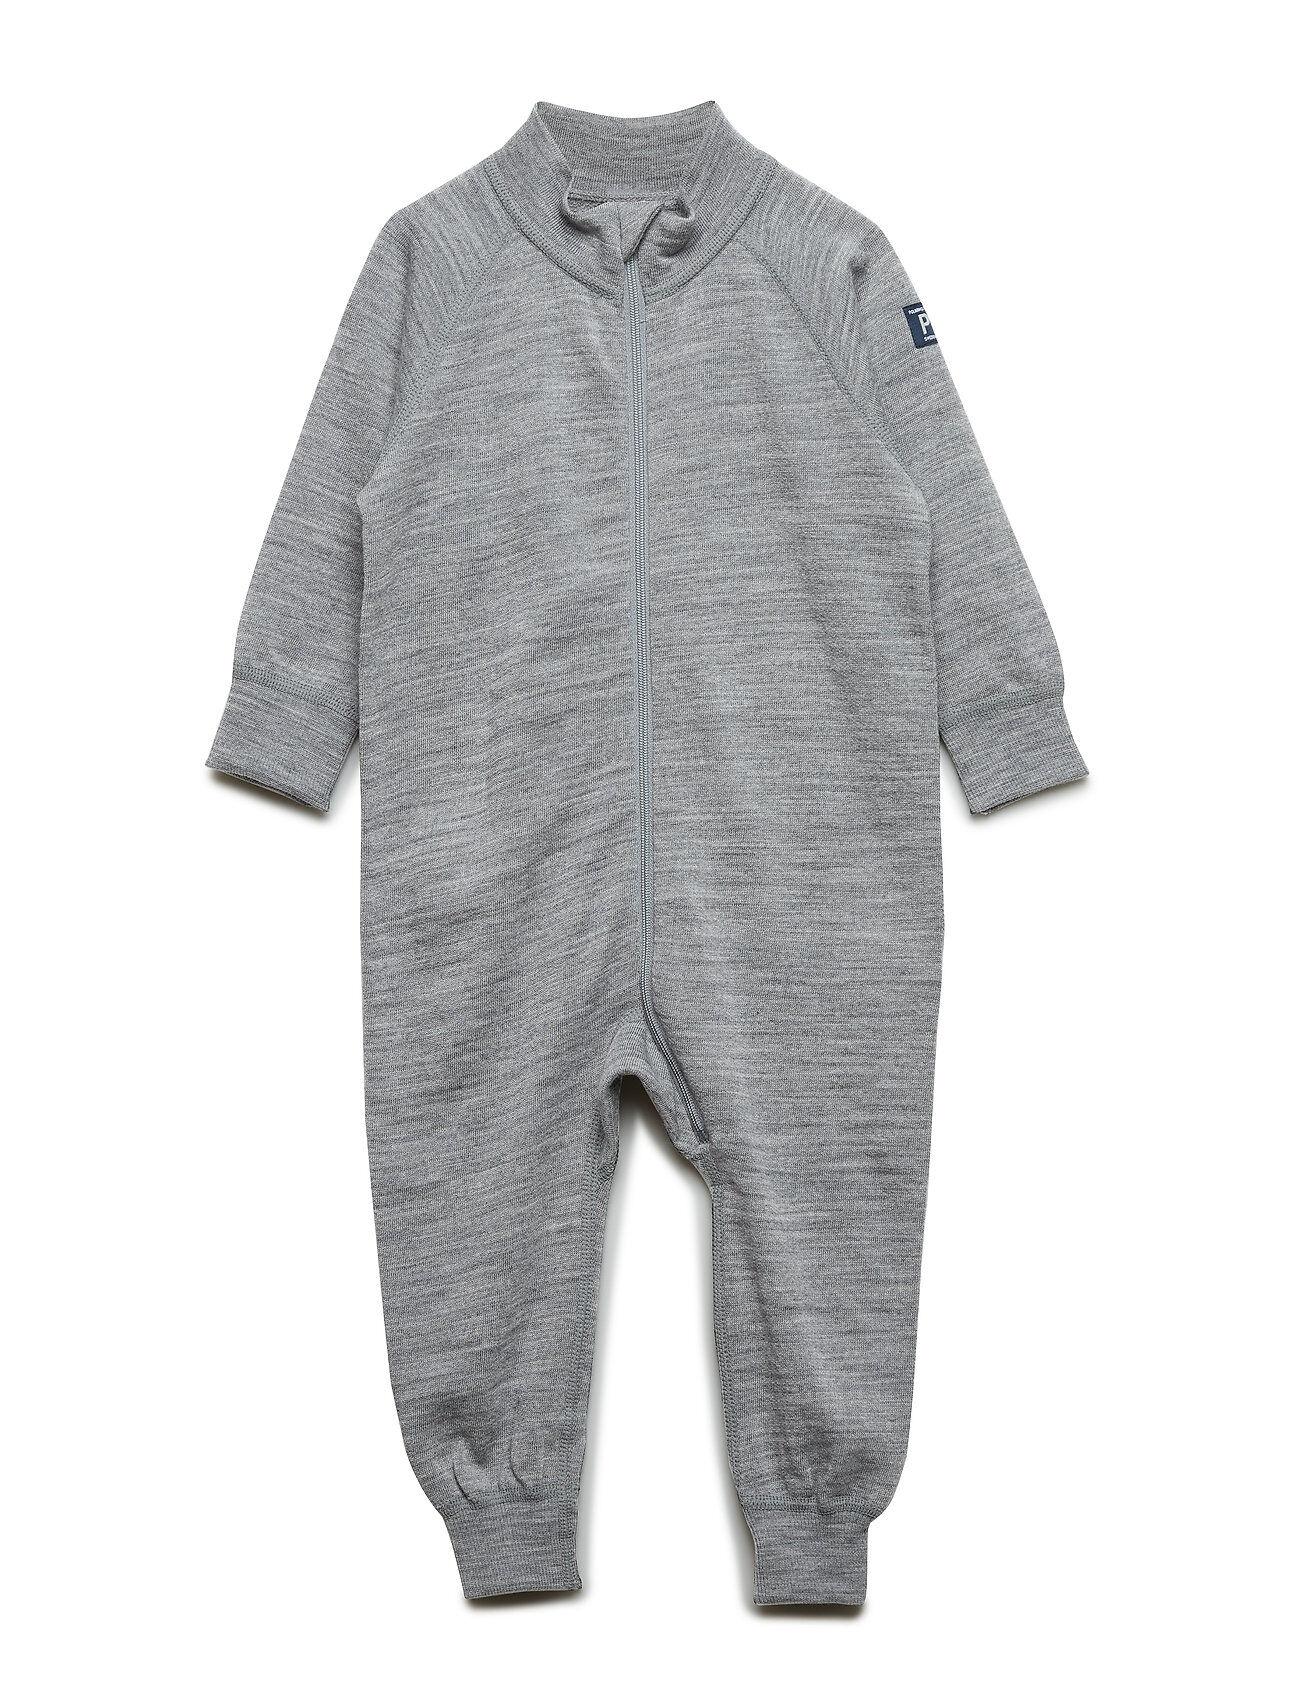 Polarn O. Pyret Overall Solid Wool Baby Pitkähihainen Body Harmaa